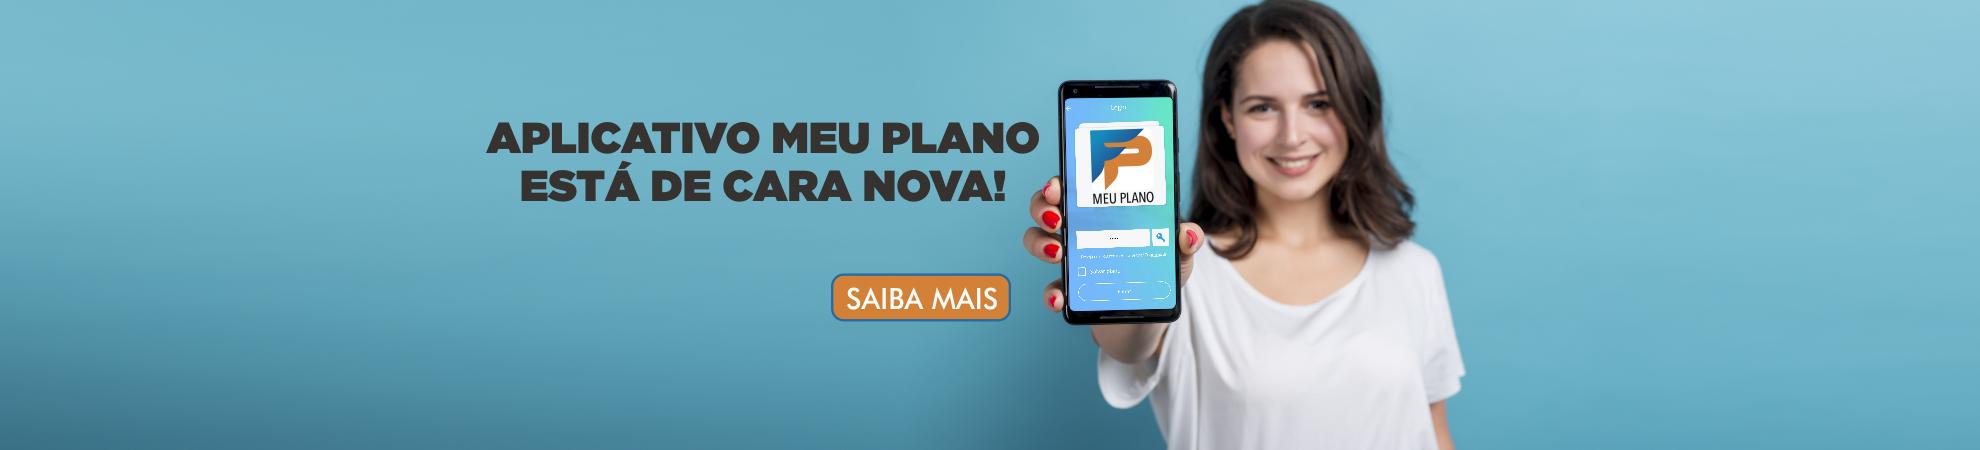 banner_app_meu_plano_2